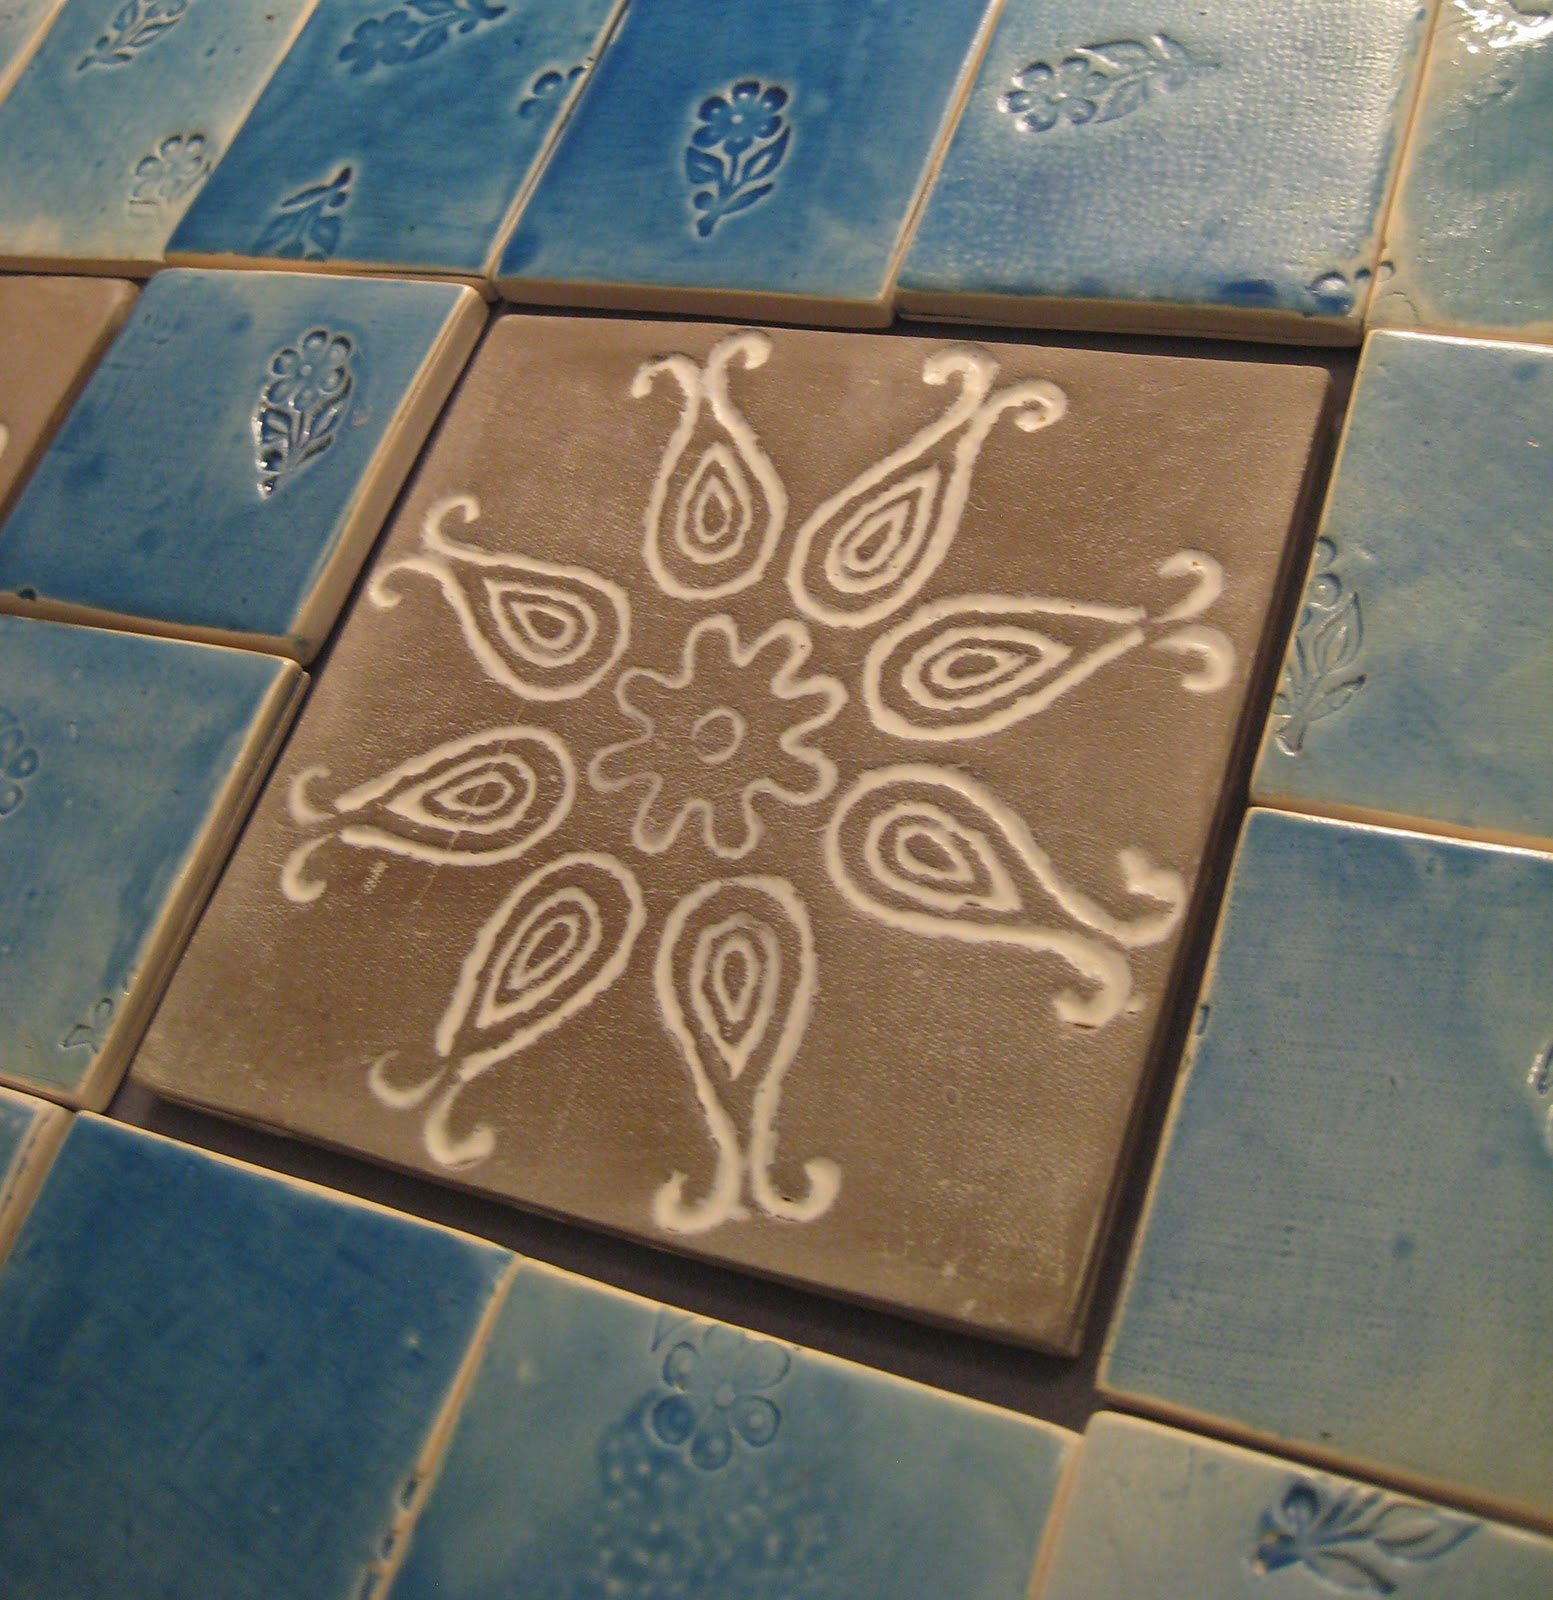 Mud hut company handmade india floor tiles for Deck tiles india